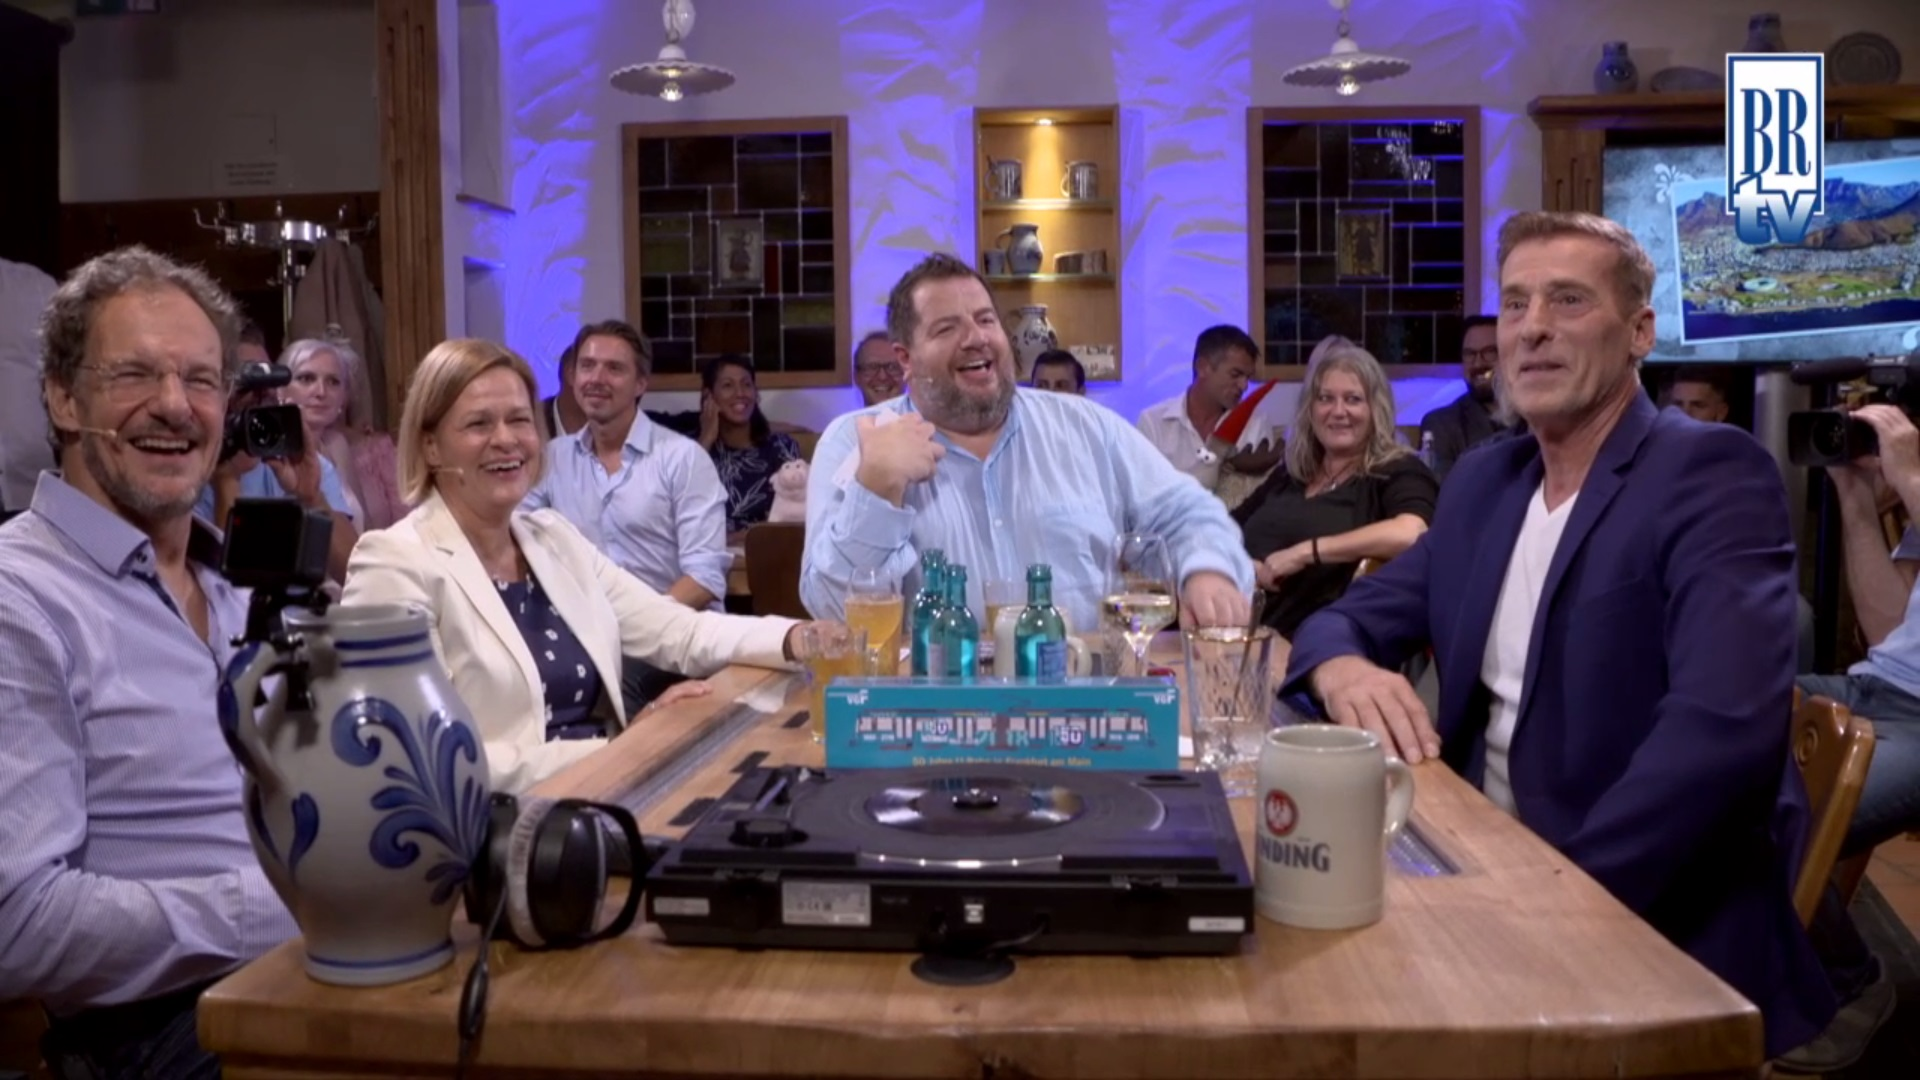 Bembel & Gebabbel – Folge 37 mit Uli Stein, Nancy Faeser & Chin Meyer